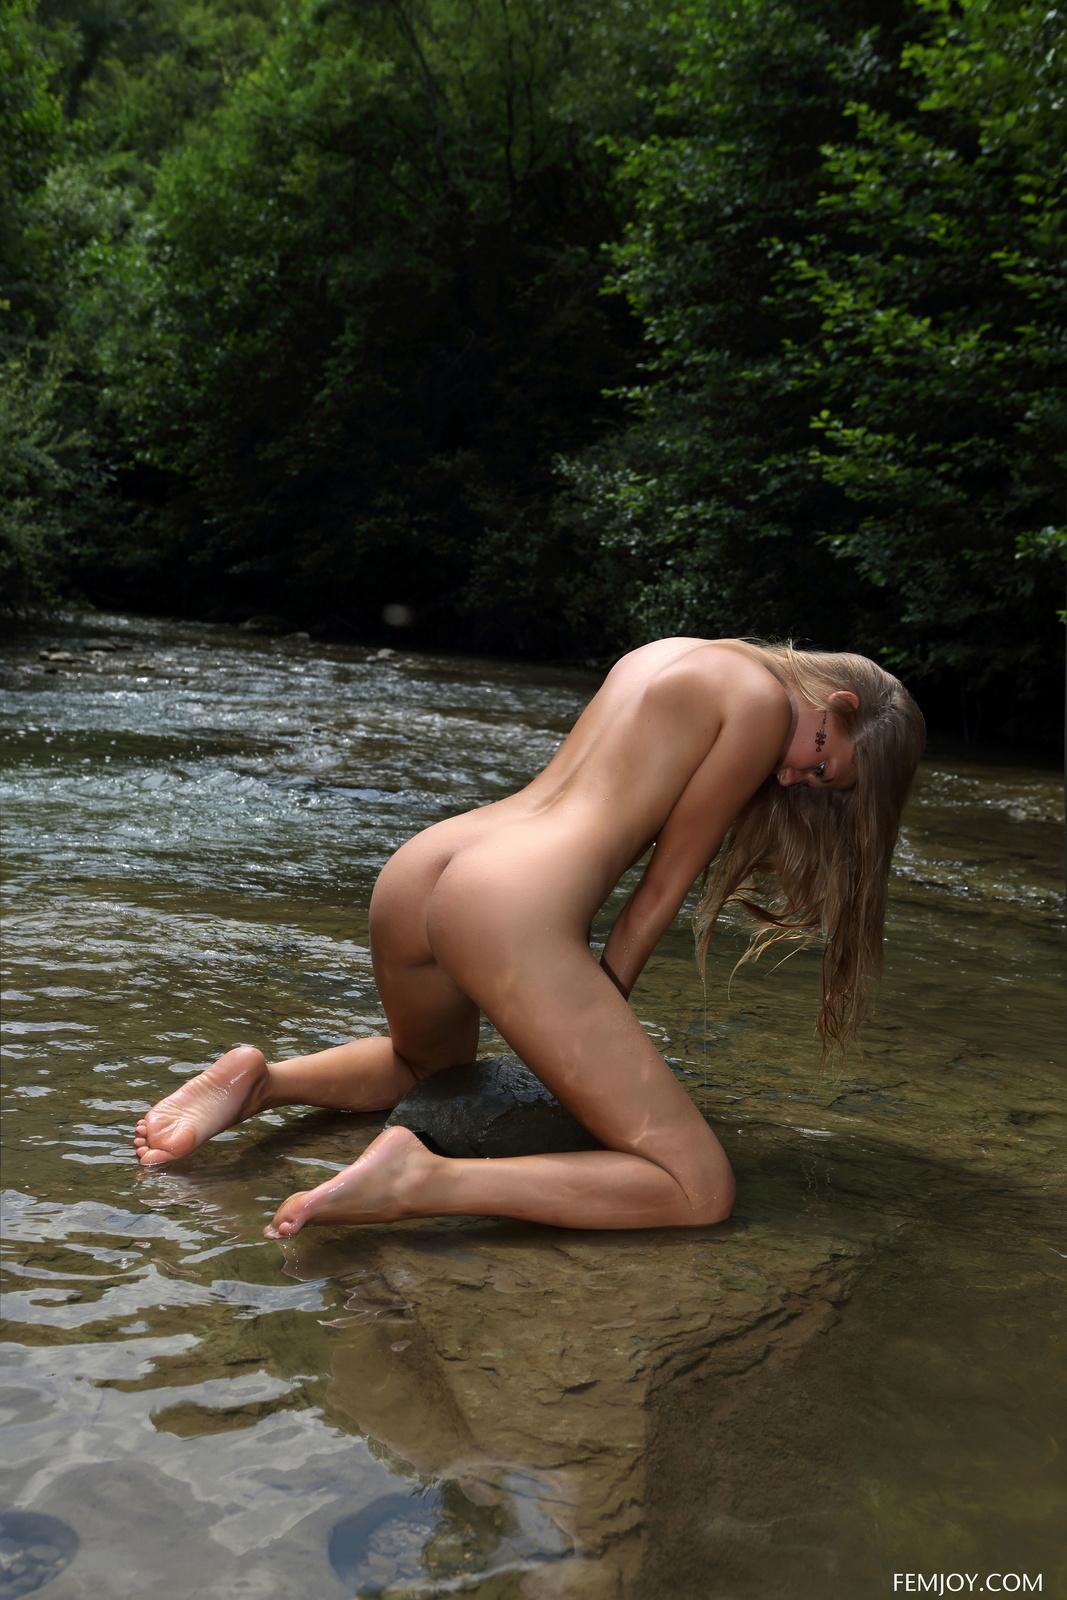 Zdjęcie porno - 048 - Jędrny biust mokrej blondyny